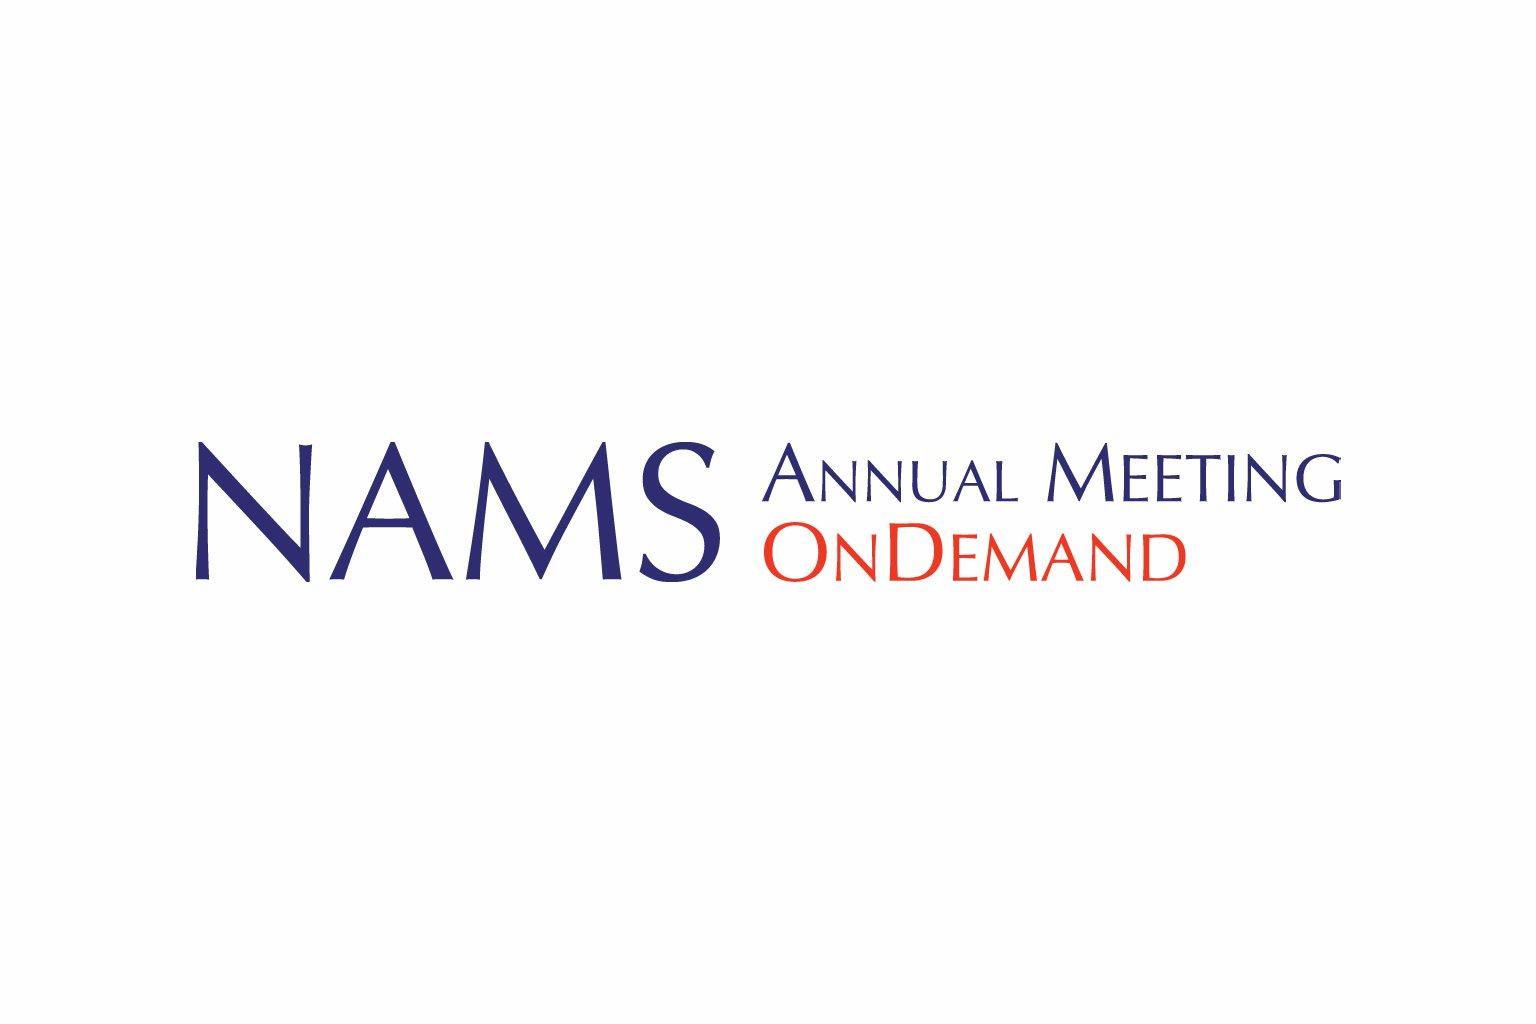 NAMS OnDemand logo